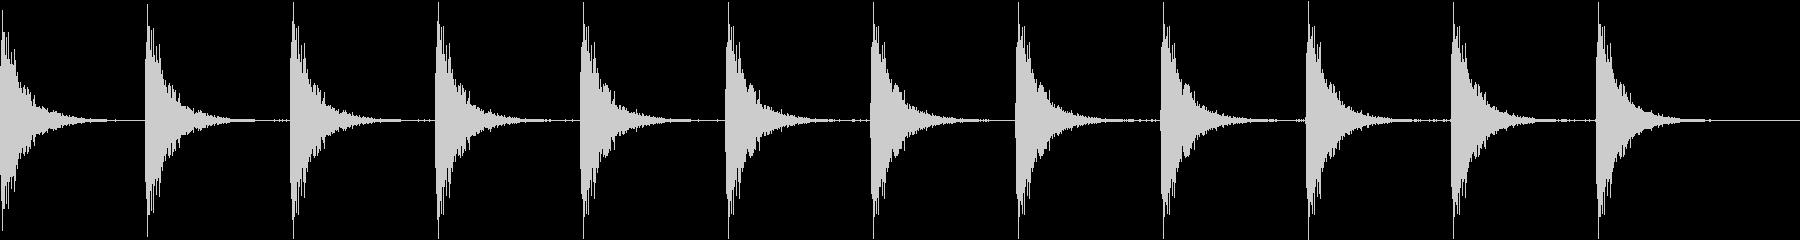 Kitchen ガスコンロの点火音 2の未再生の波形